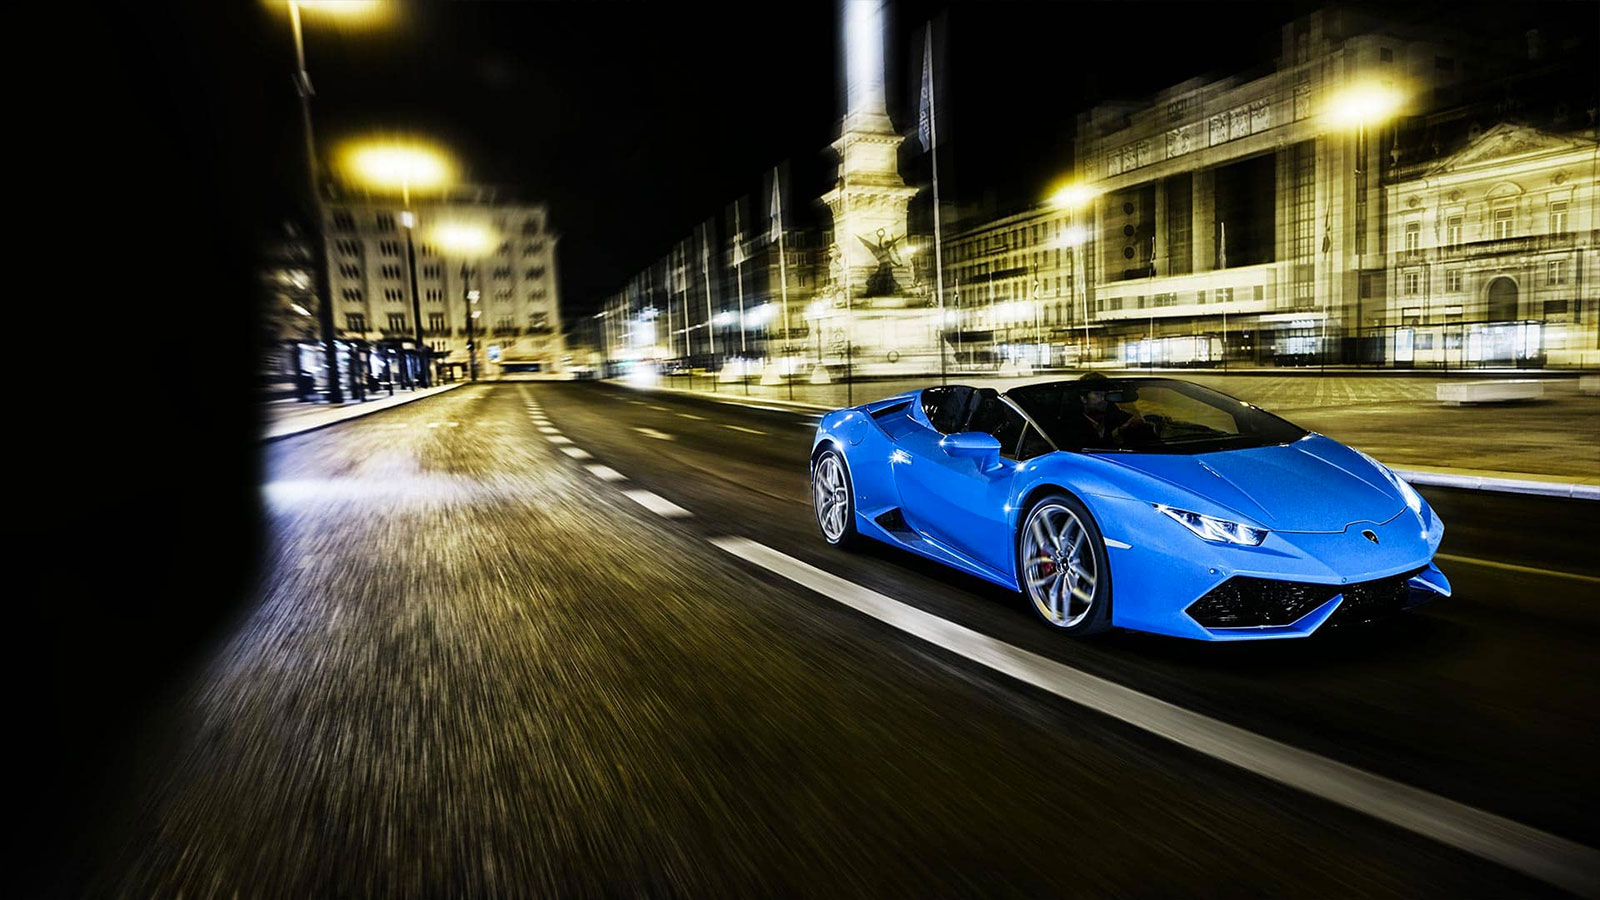 Lamborghini Huracan AWD Spyder - Inspiring Technology image 5